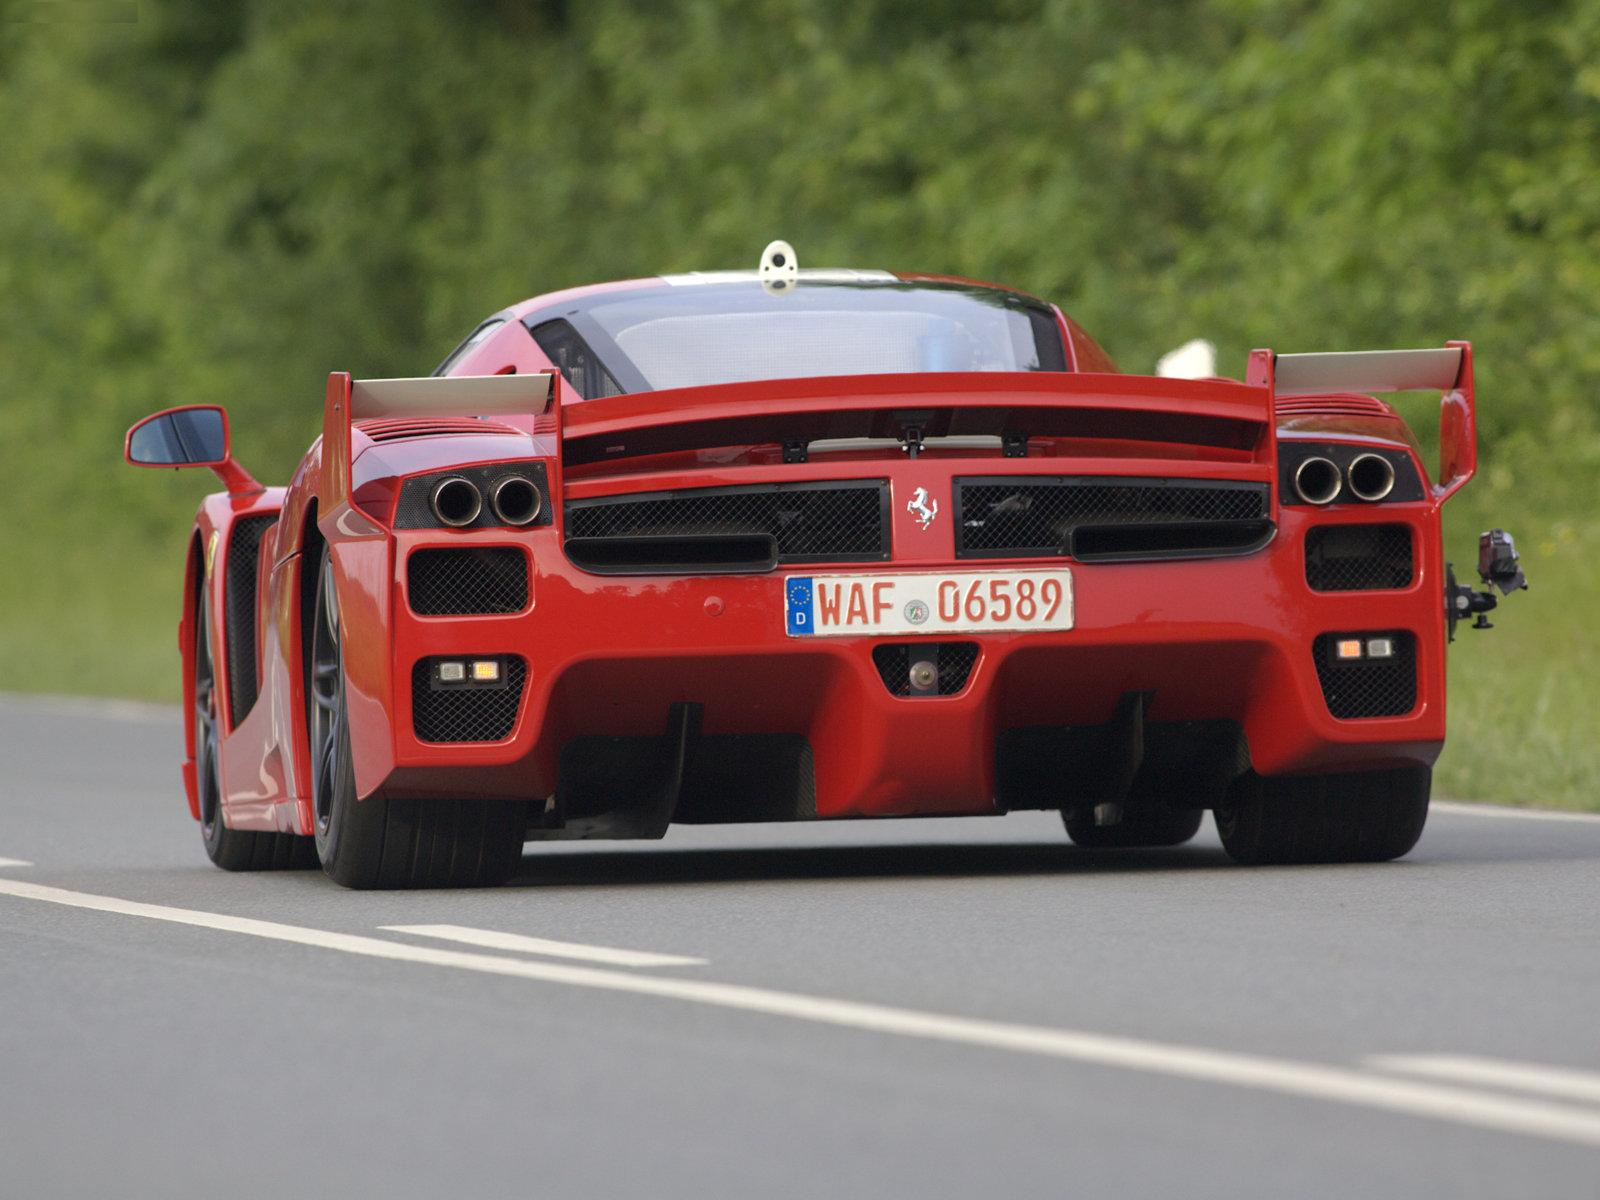 http://1.bp.blogspot.com/_sRGU_JXOz6E/TRpRtwyDuFI/AAAAAAAAA2I/tA-484M_Ap4/s1600/Edo-Ferrari_FXX_2008_1600x1200_wallpaper_04.jpg